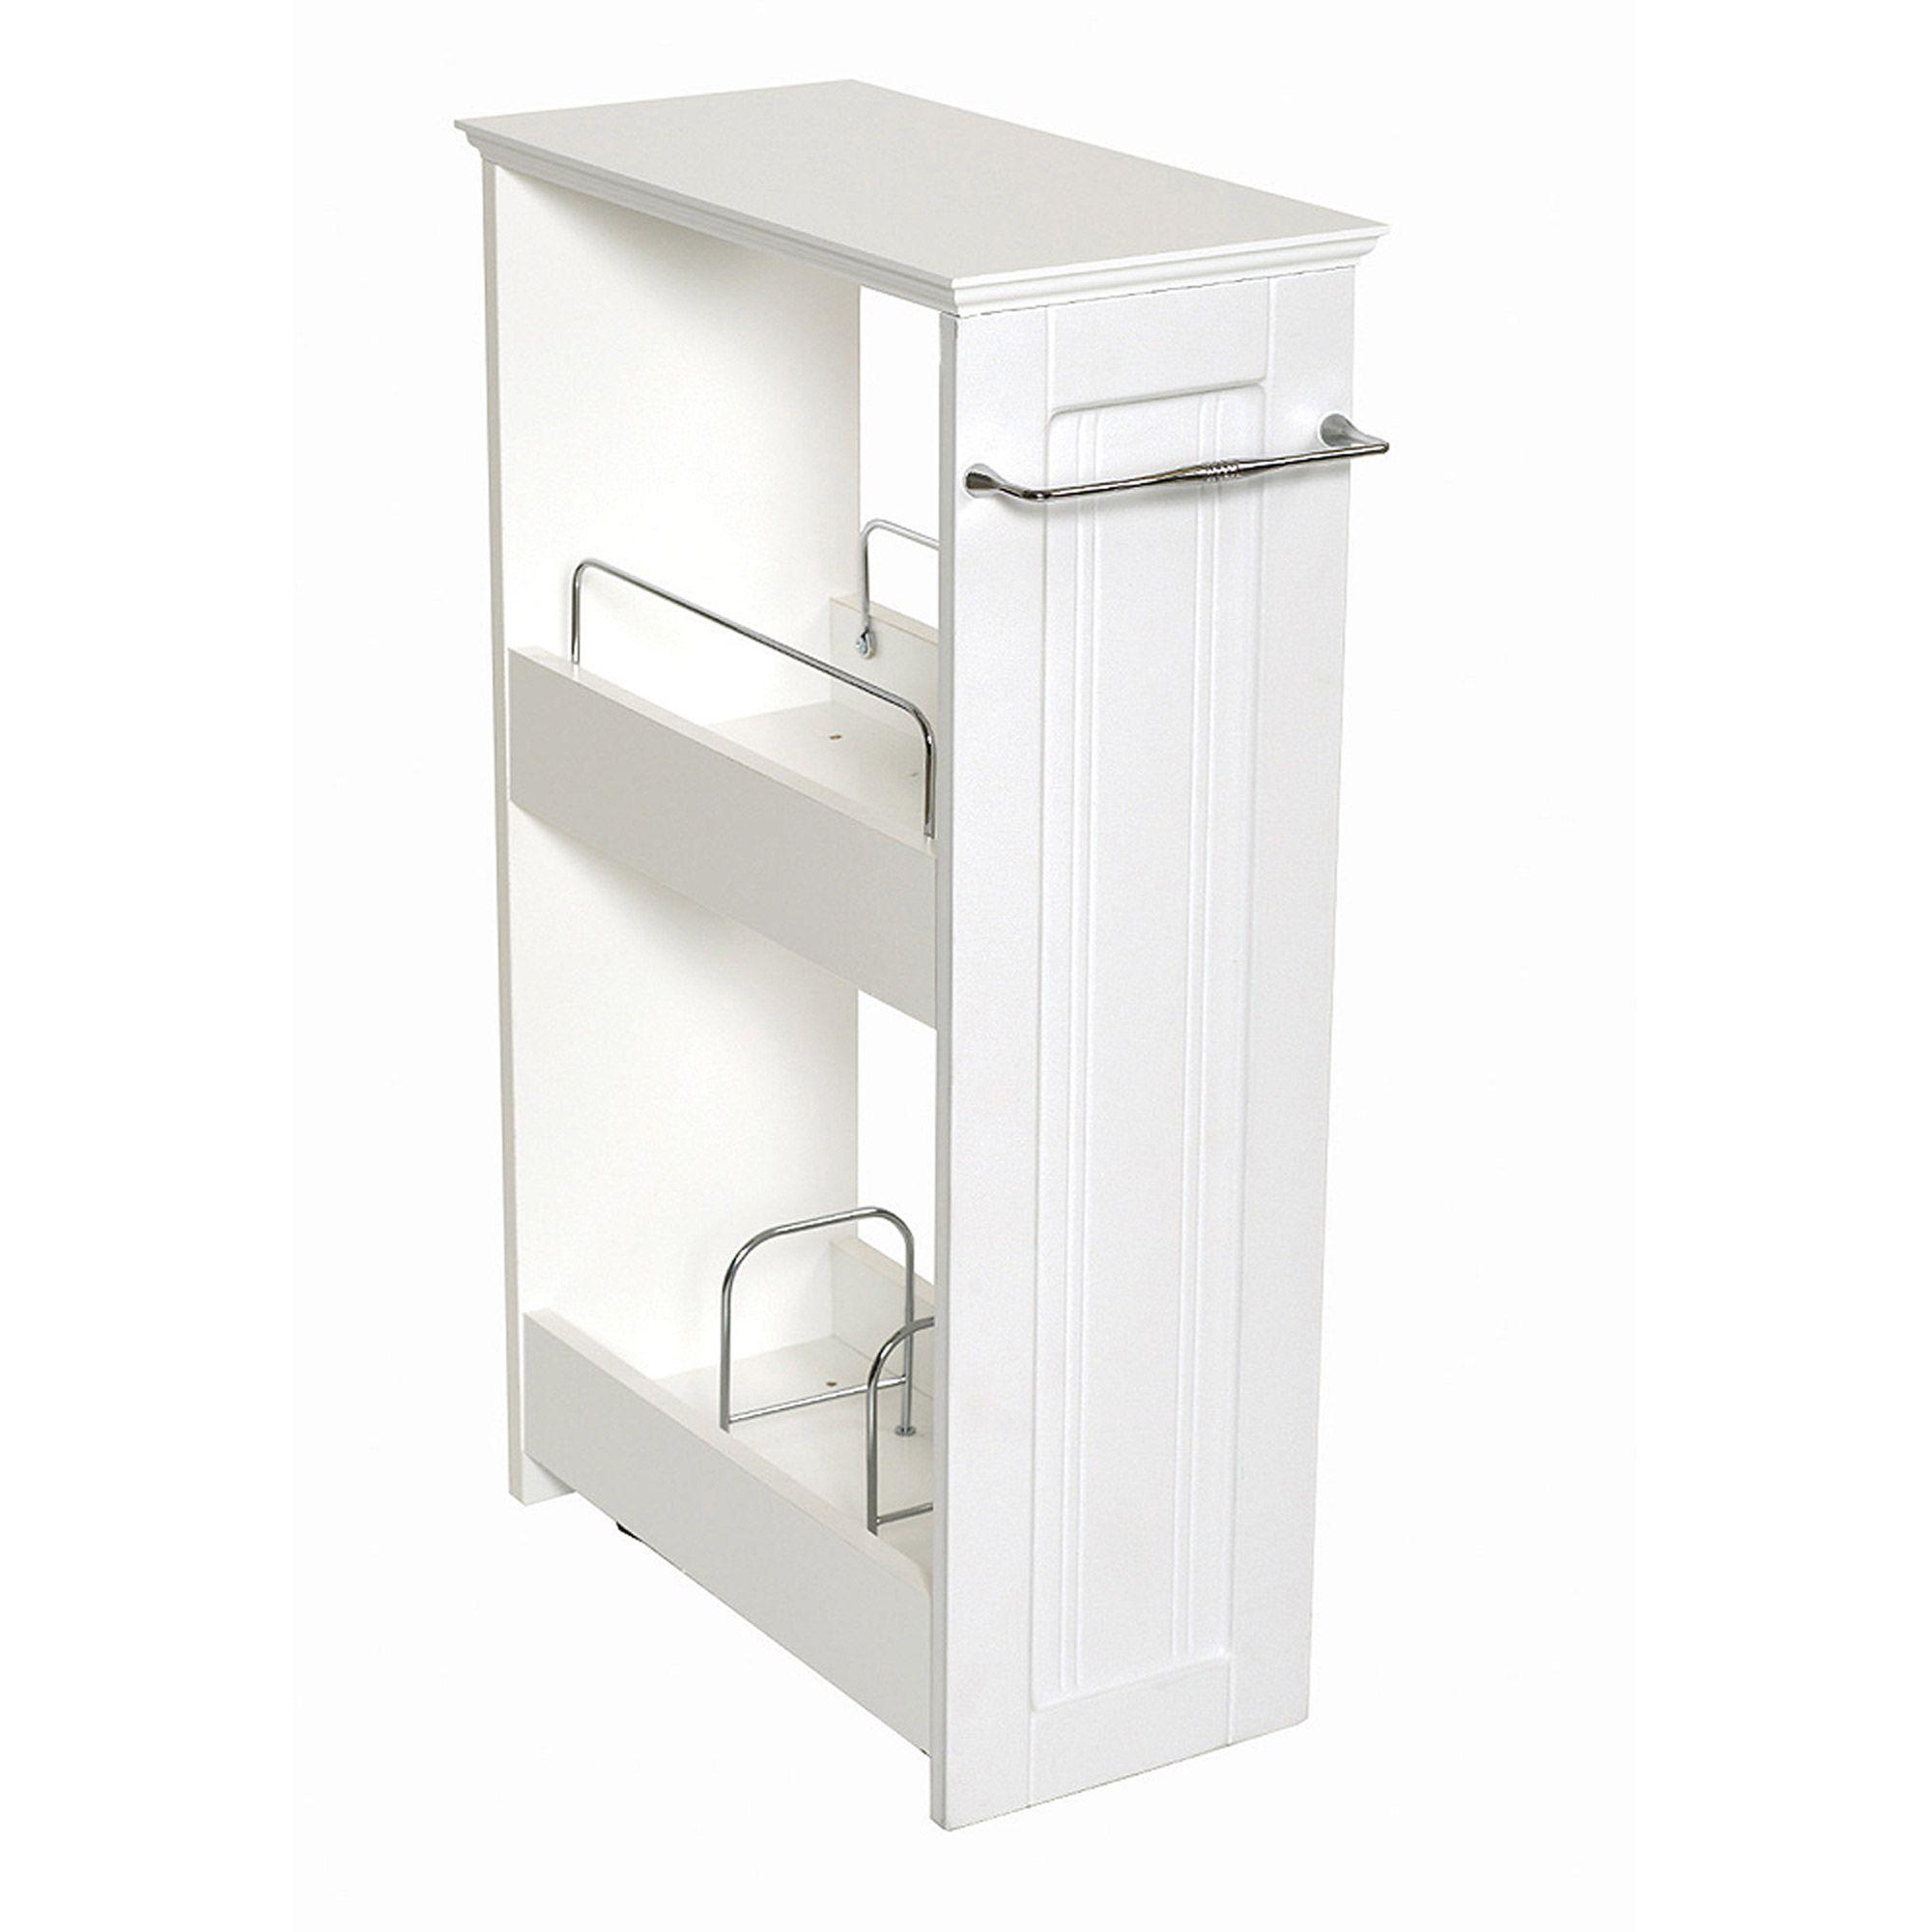 Home In 2020 Wood Storage Shelves Bathroom Storage Units Storage Shelves